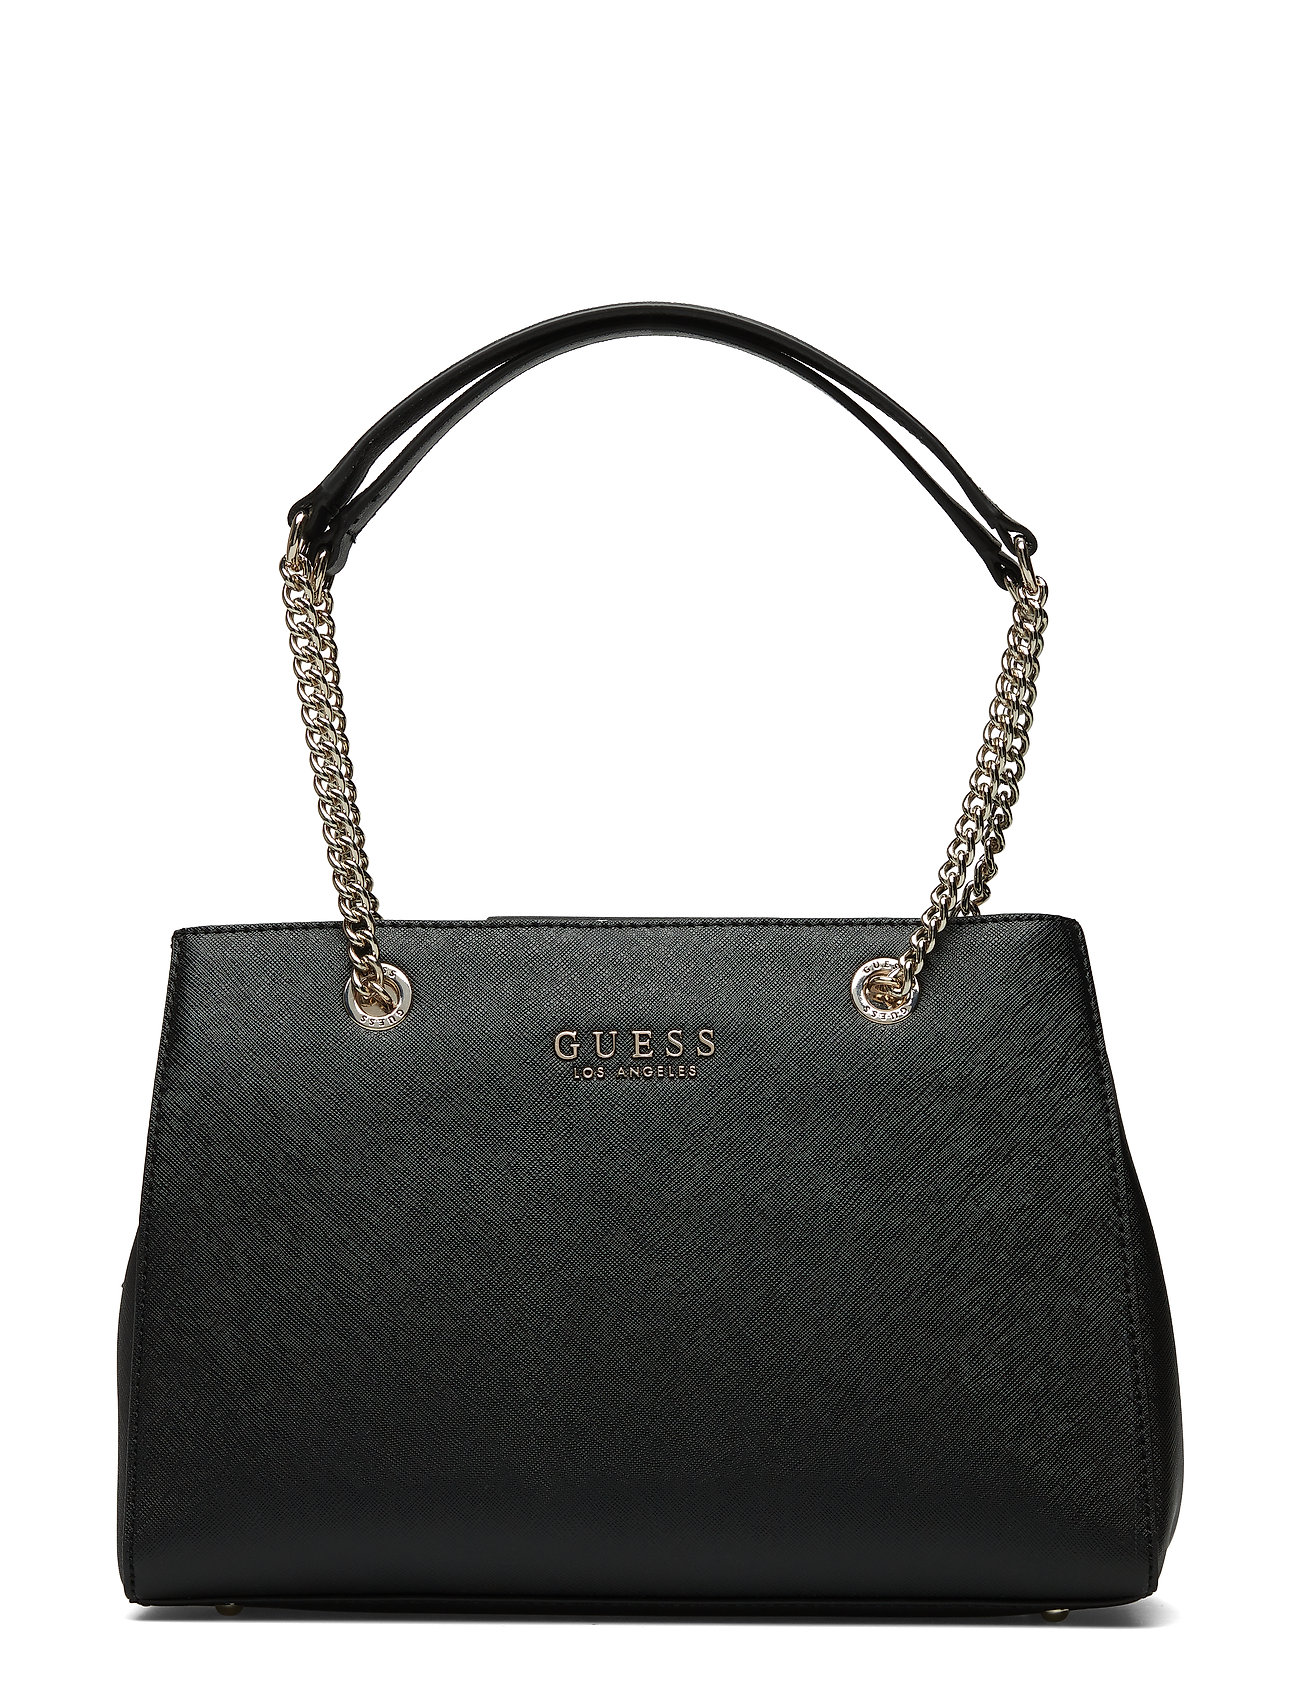 8557fb3b53262 GUESS Robyn Girlfriend Satchel Bags Top Handle Bags Schwarz GUESS